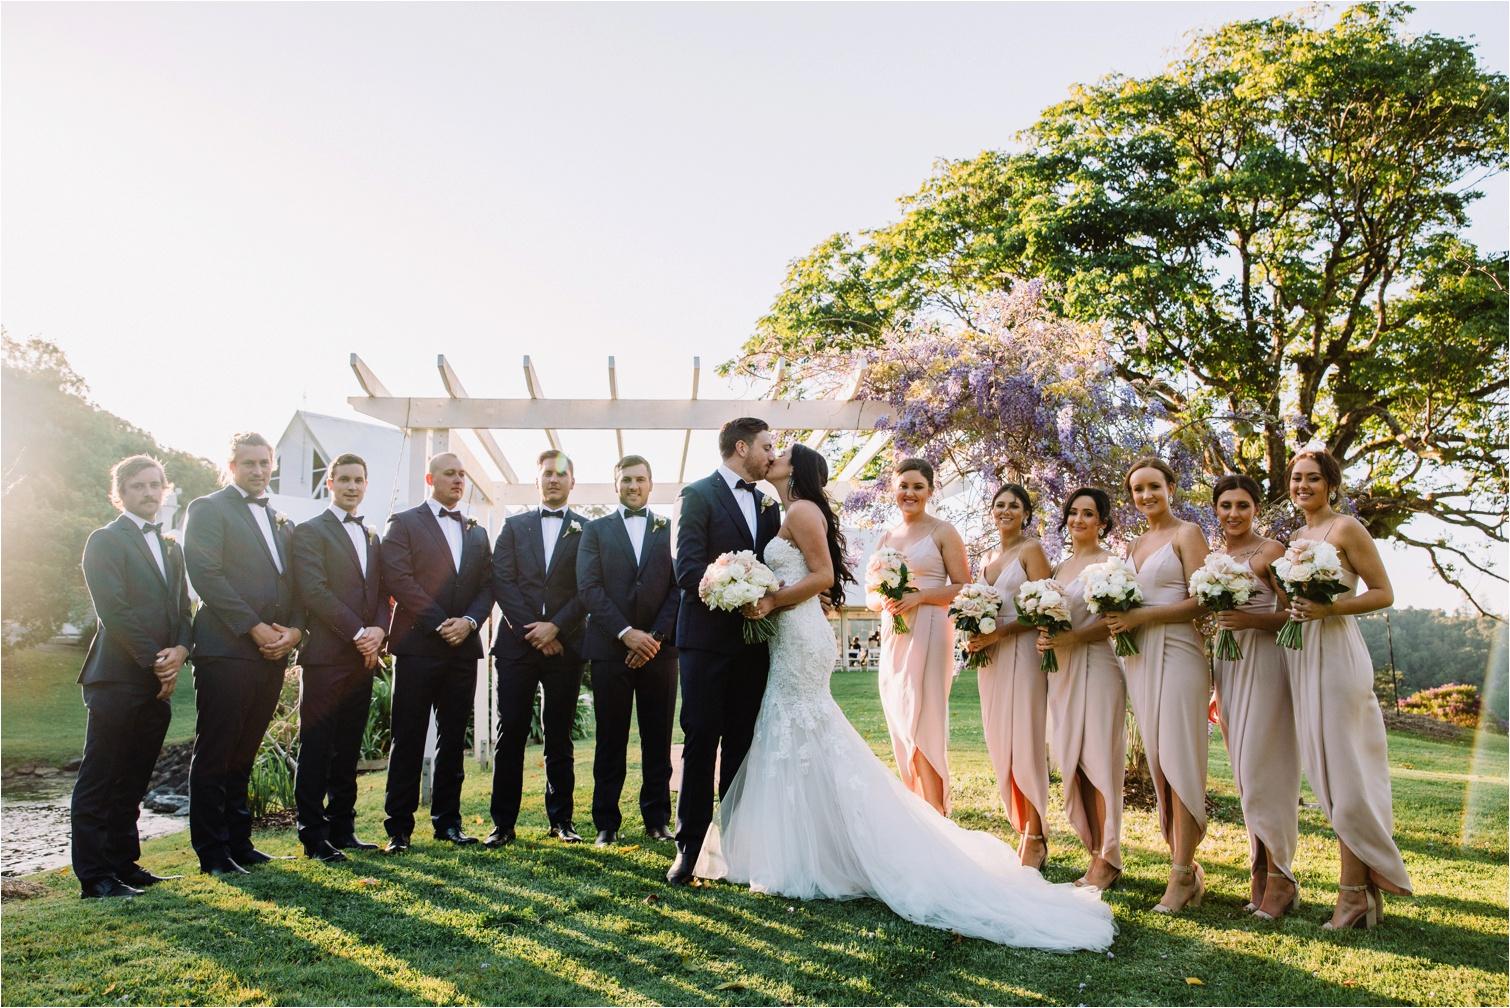 Maleny Manor Wedding Photography - Gold Coast Wedding Photographer_0034.jpg